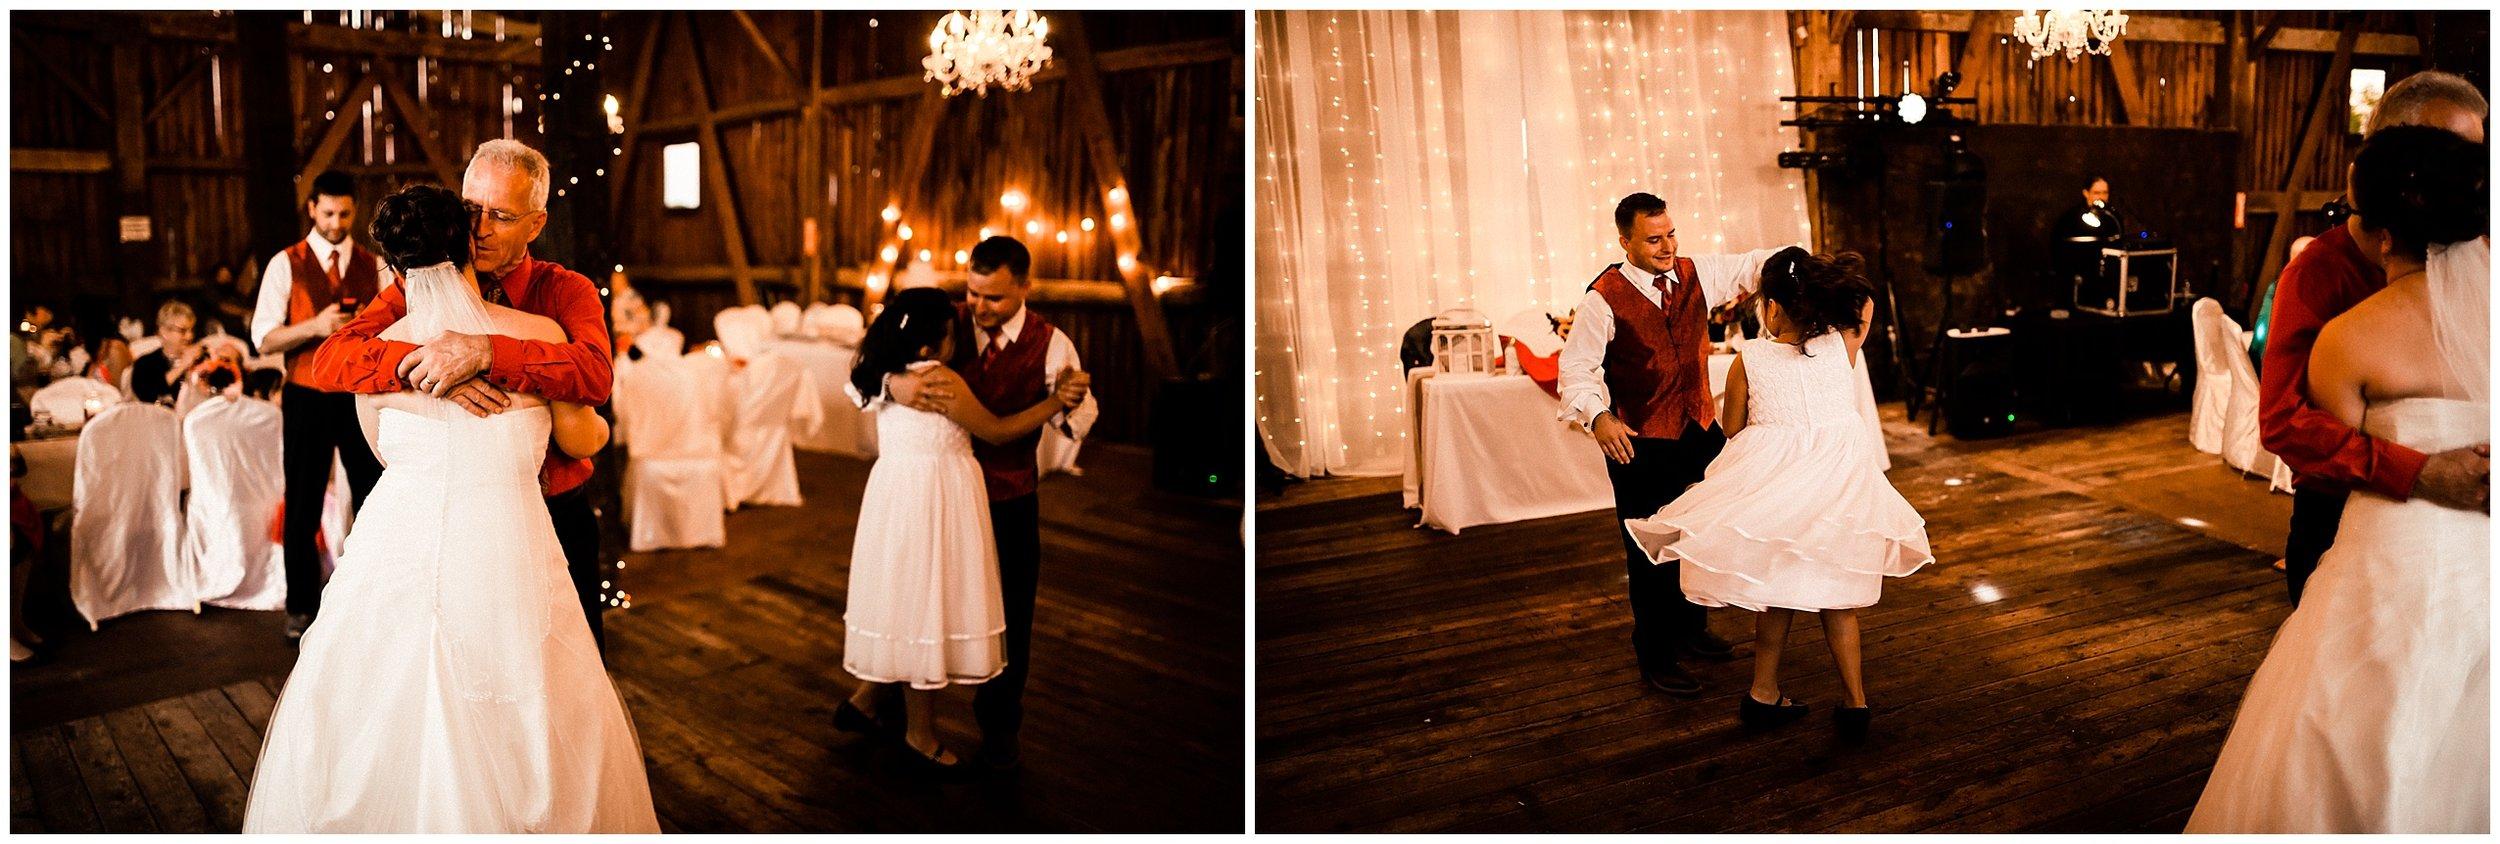 Micheal + Chelsie   Just Married #kyleepaigephotography_1620.jpg